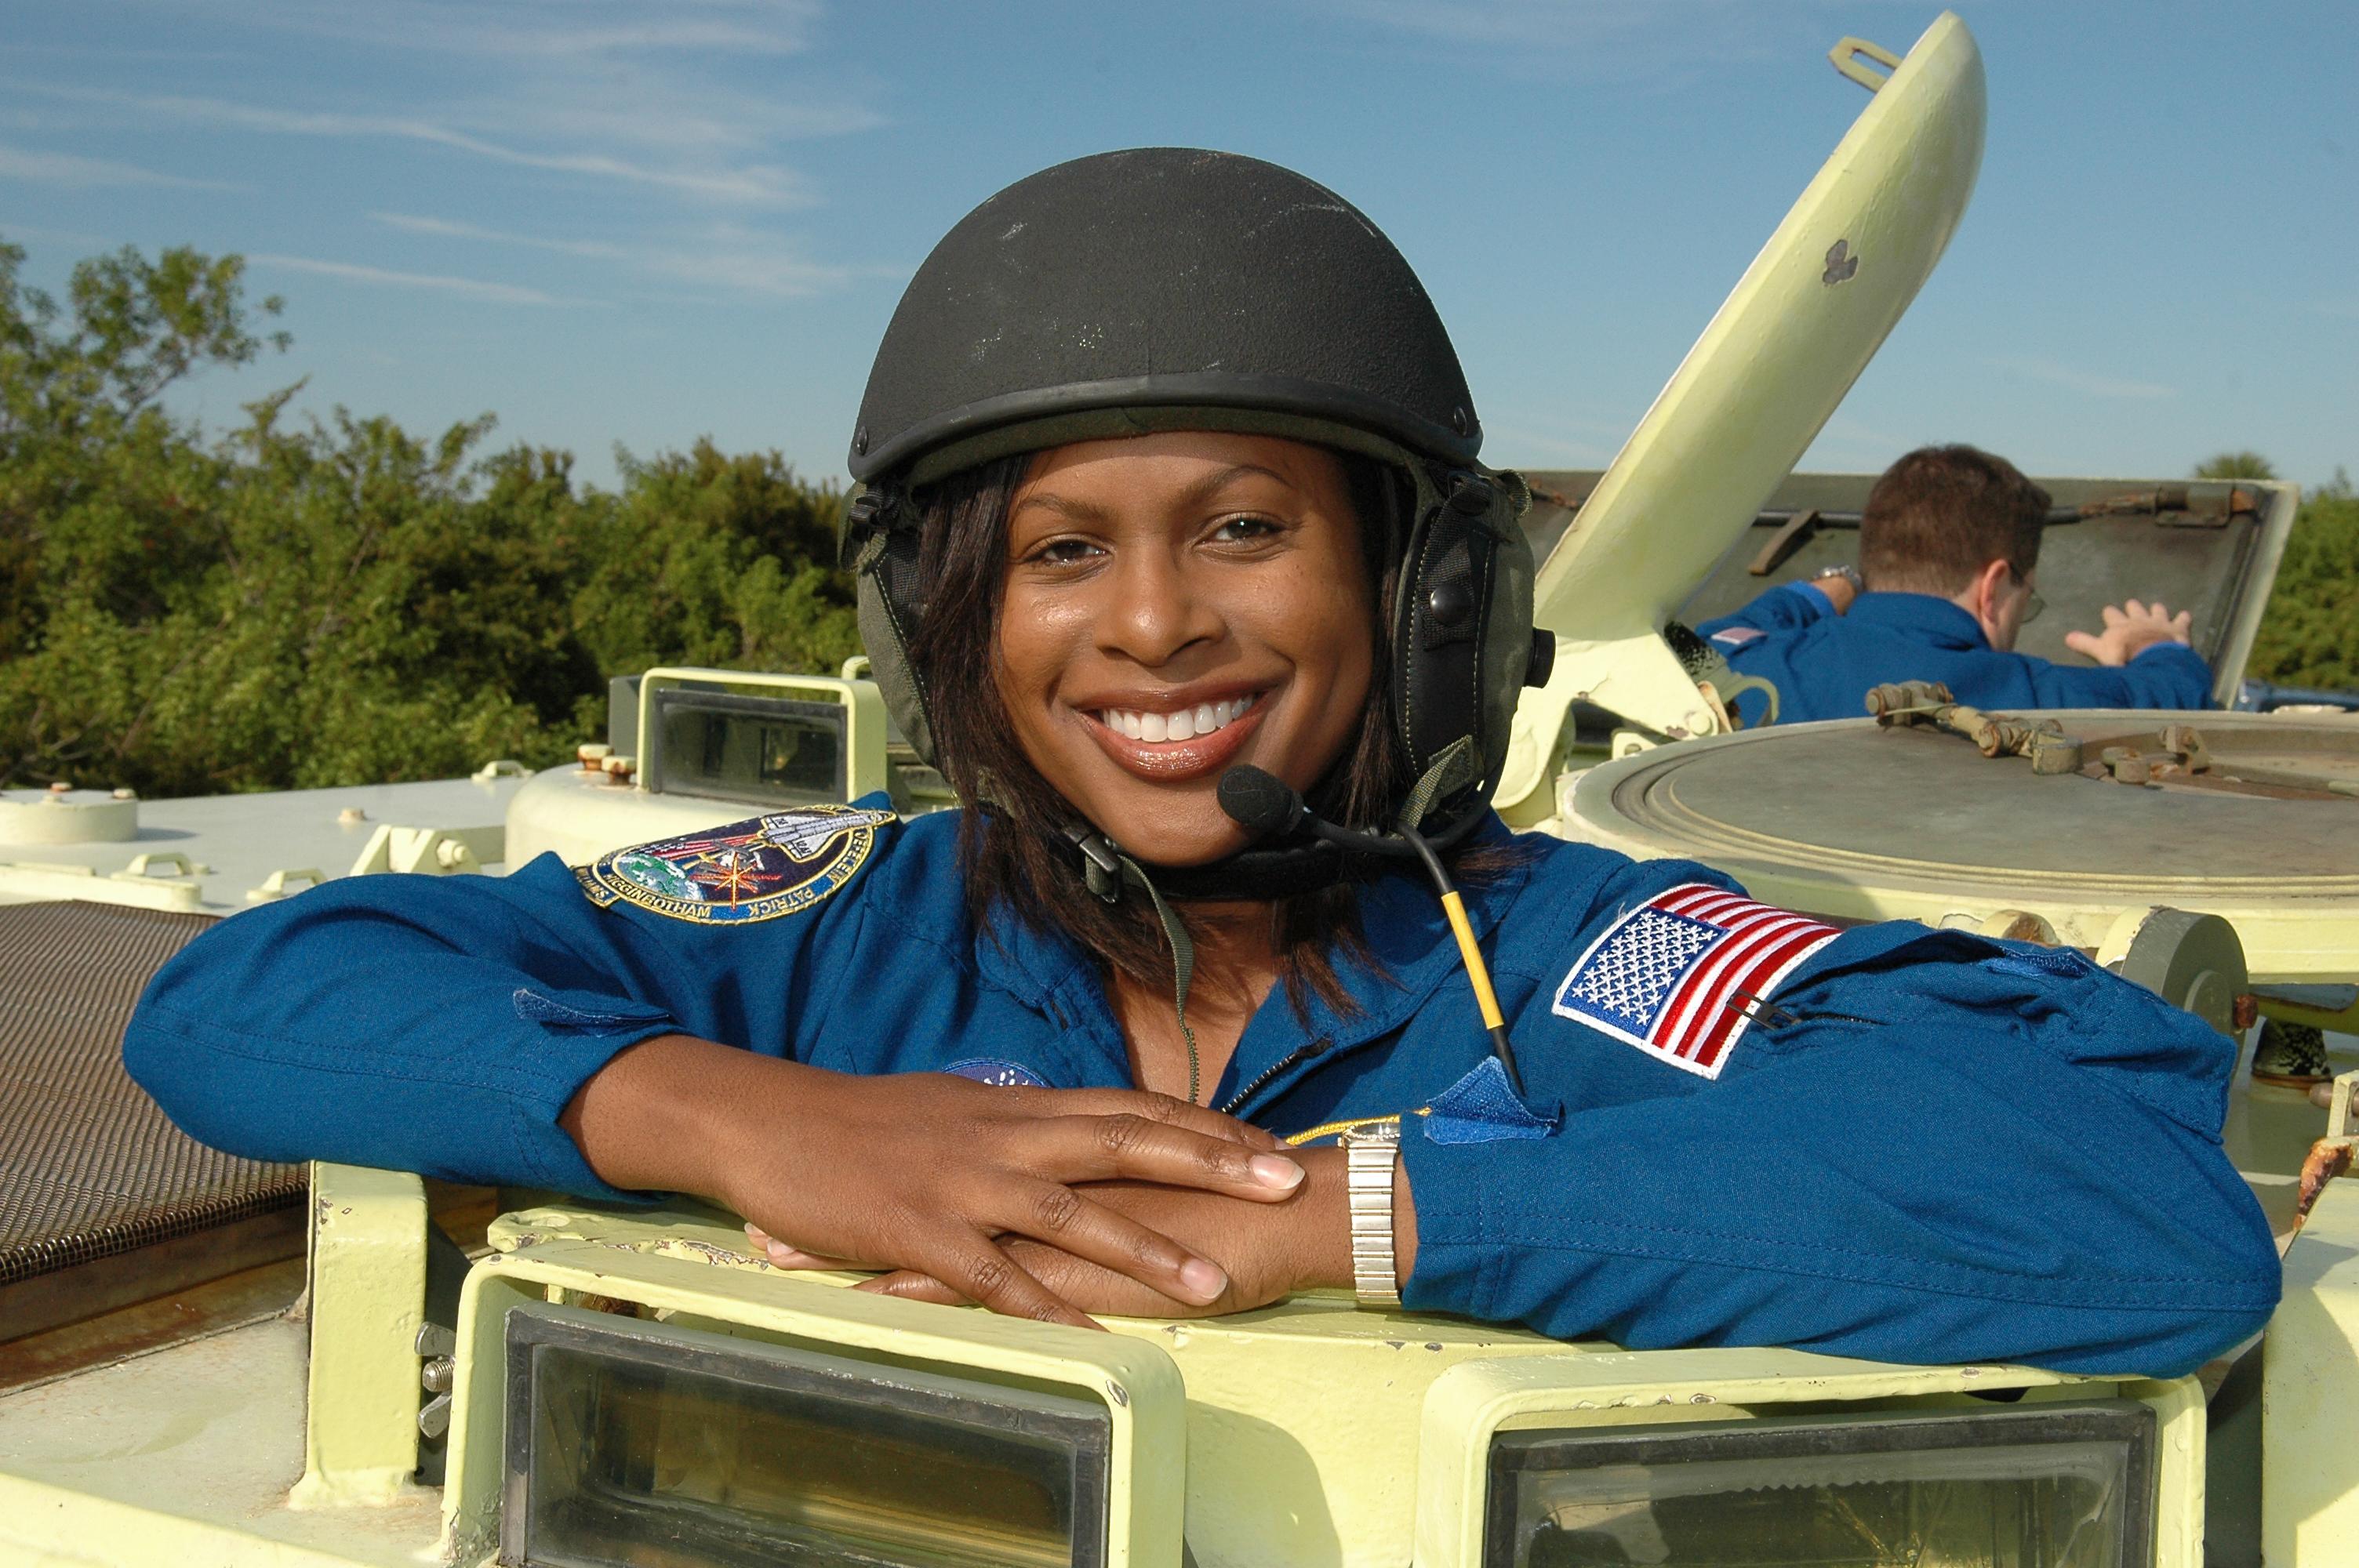 joan the astronaut - photo #19